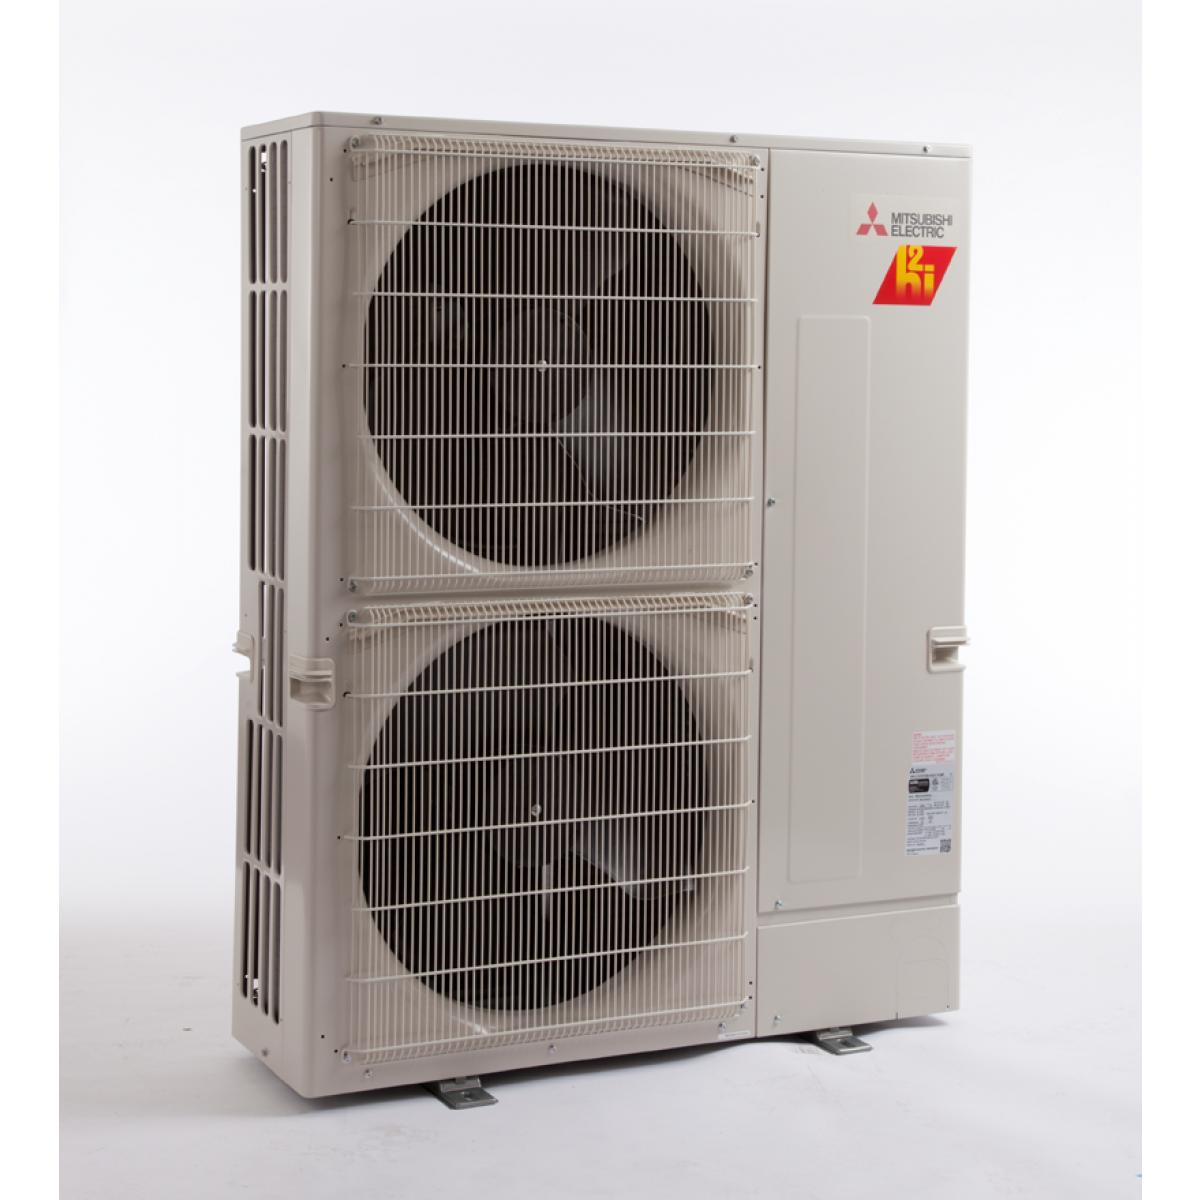 mitsubishi mini conditioner en mount split btu quad article mxz normal fit ductless hyper hei wid zone constrain air wall heat